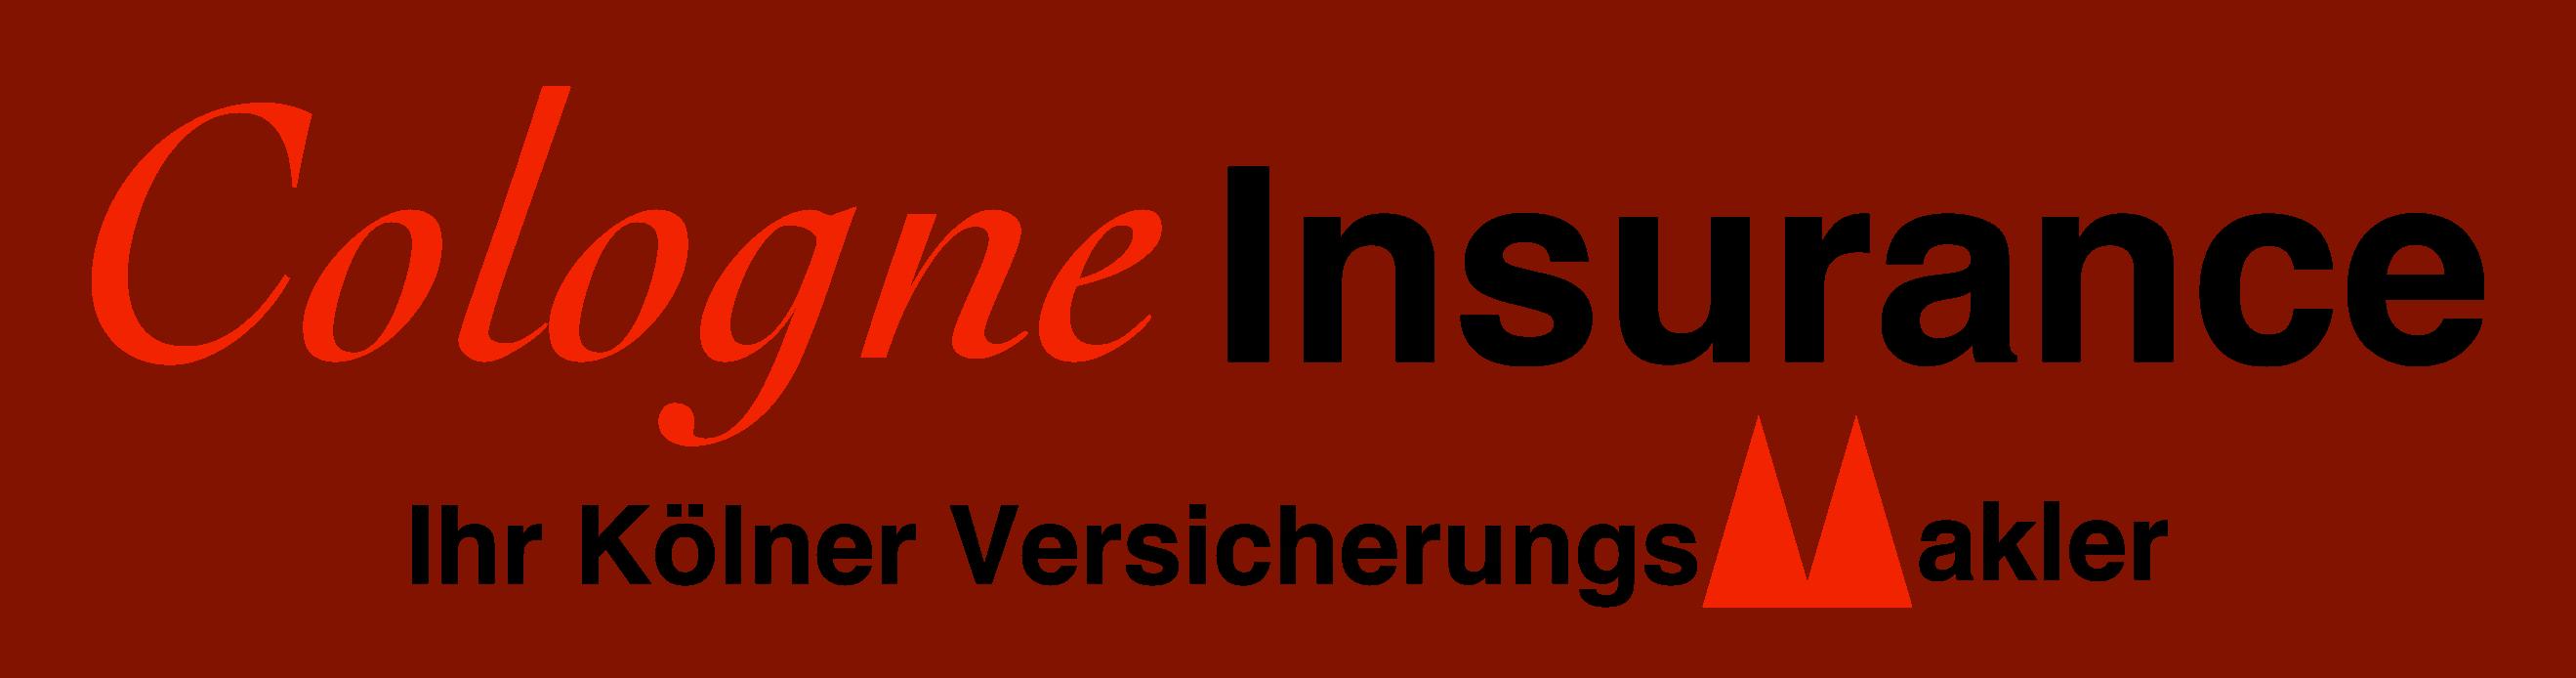 Cologne Insurance Logo